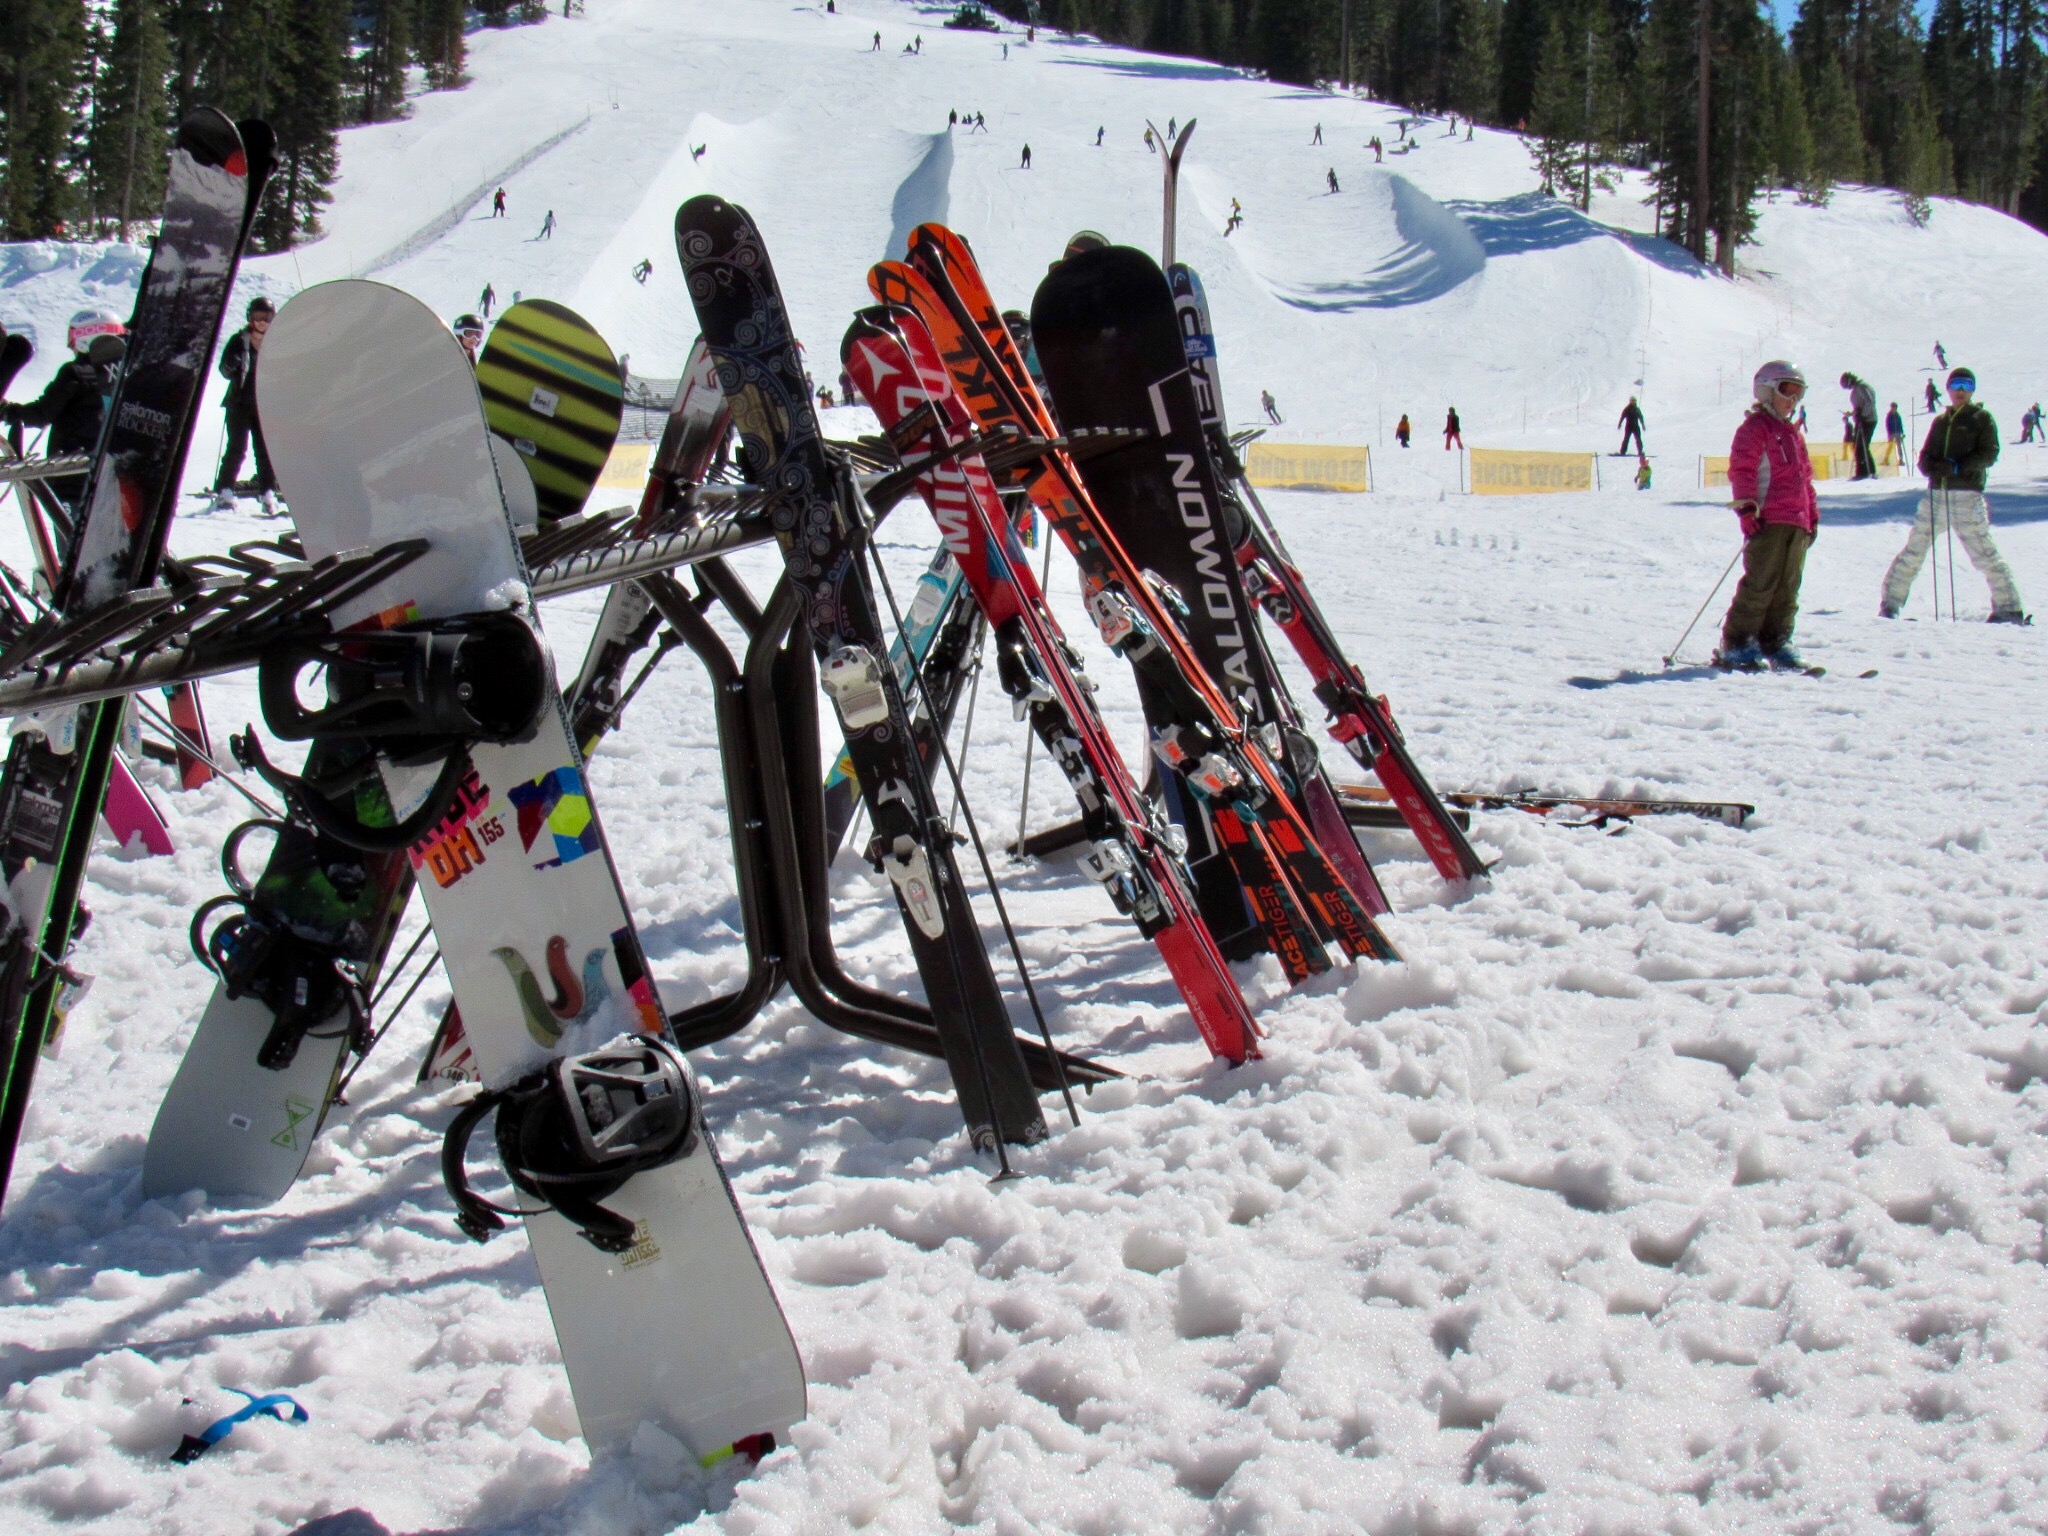 Snowboards at Northstar